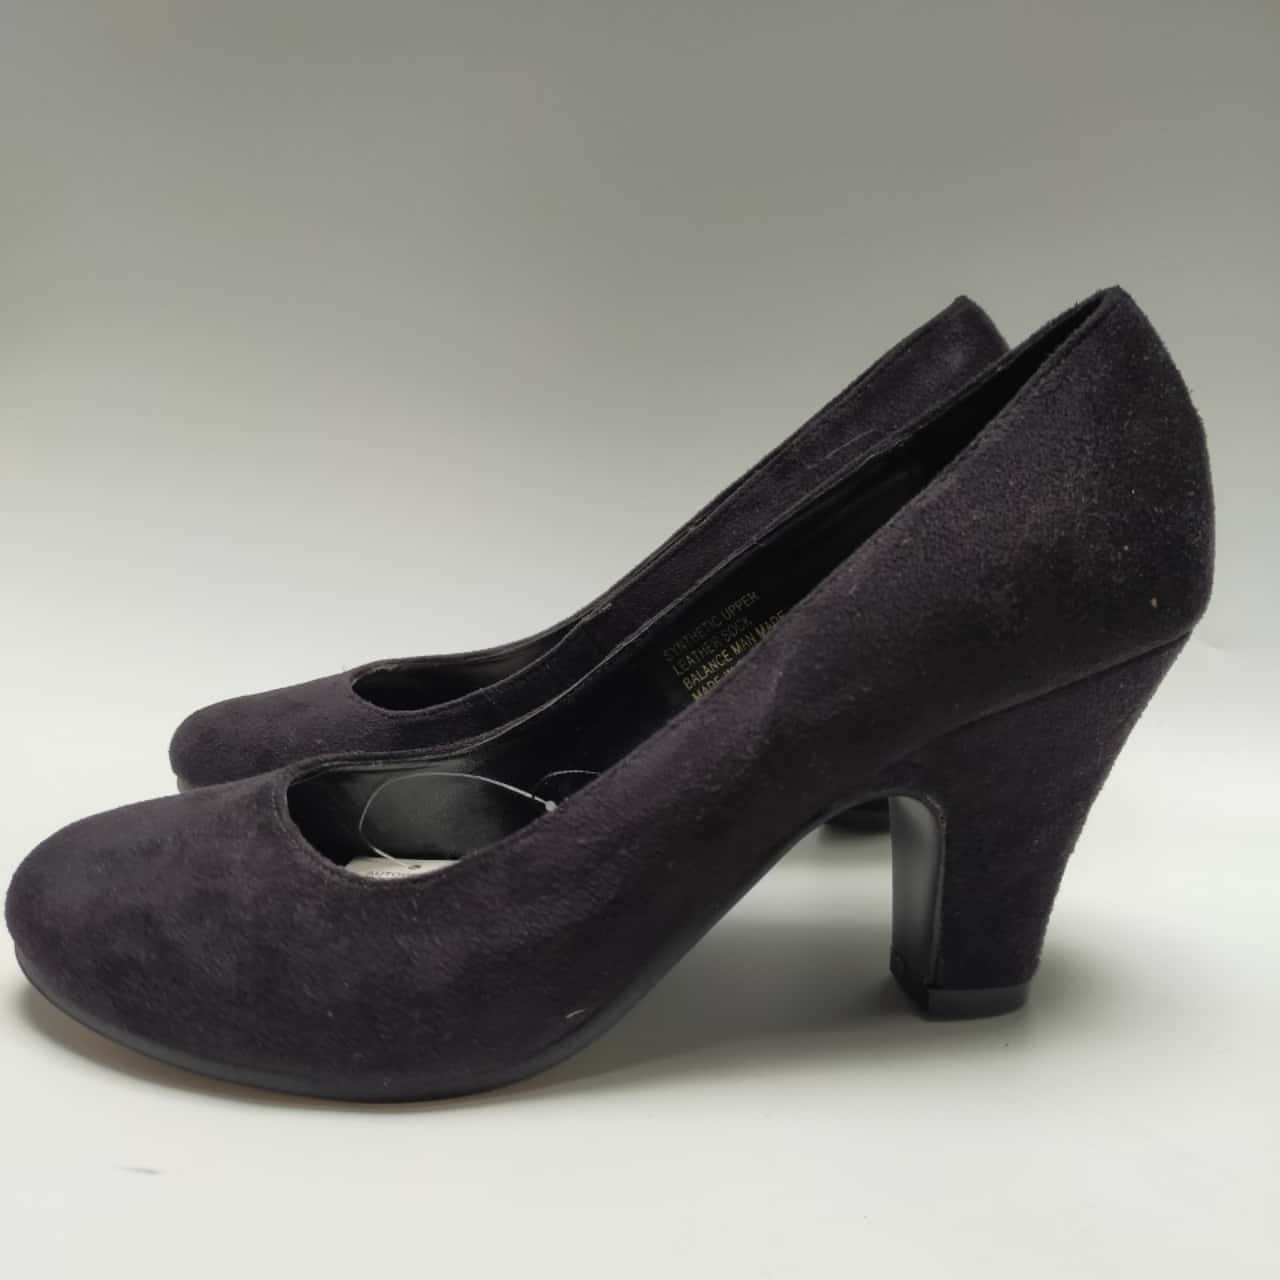 Autograph Womens Heels Size 8 Black